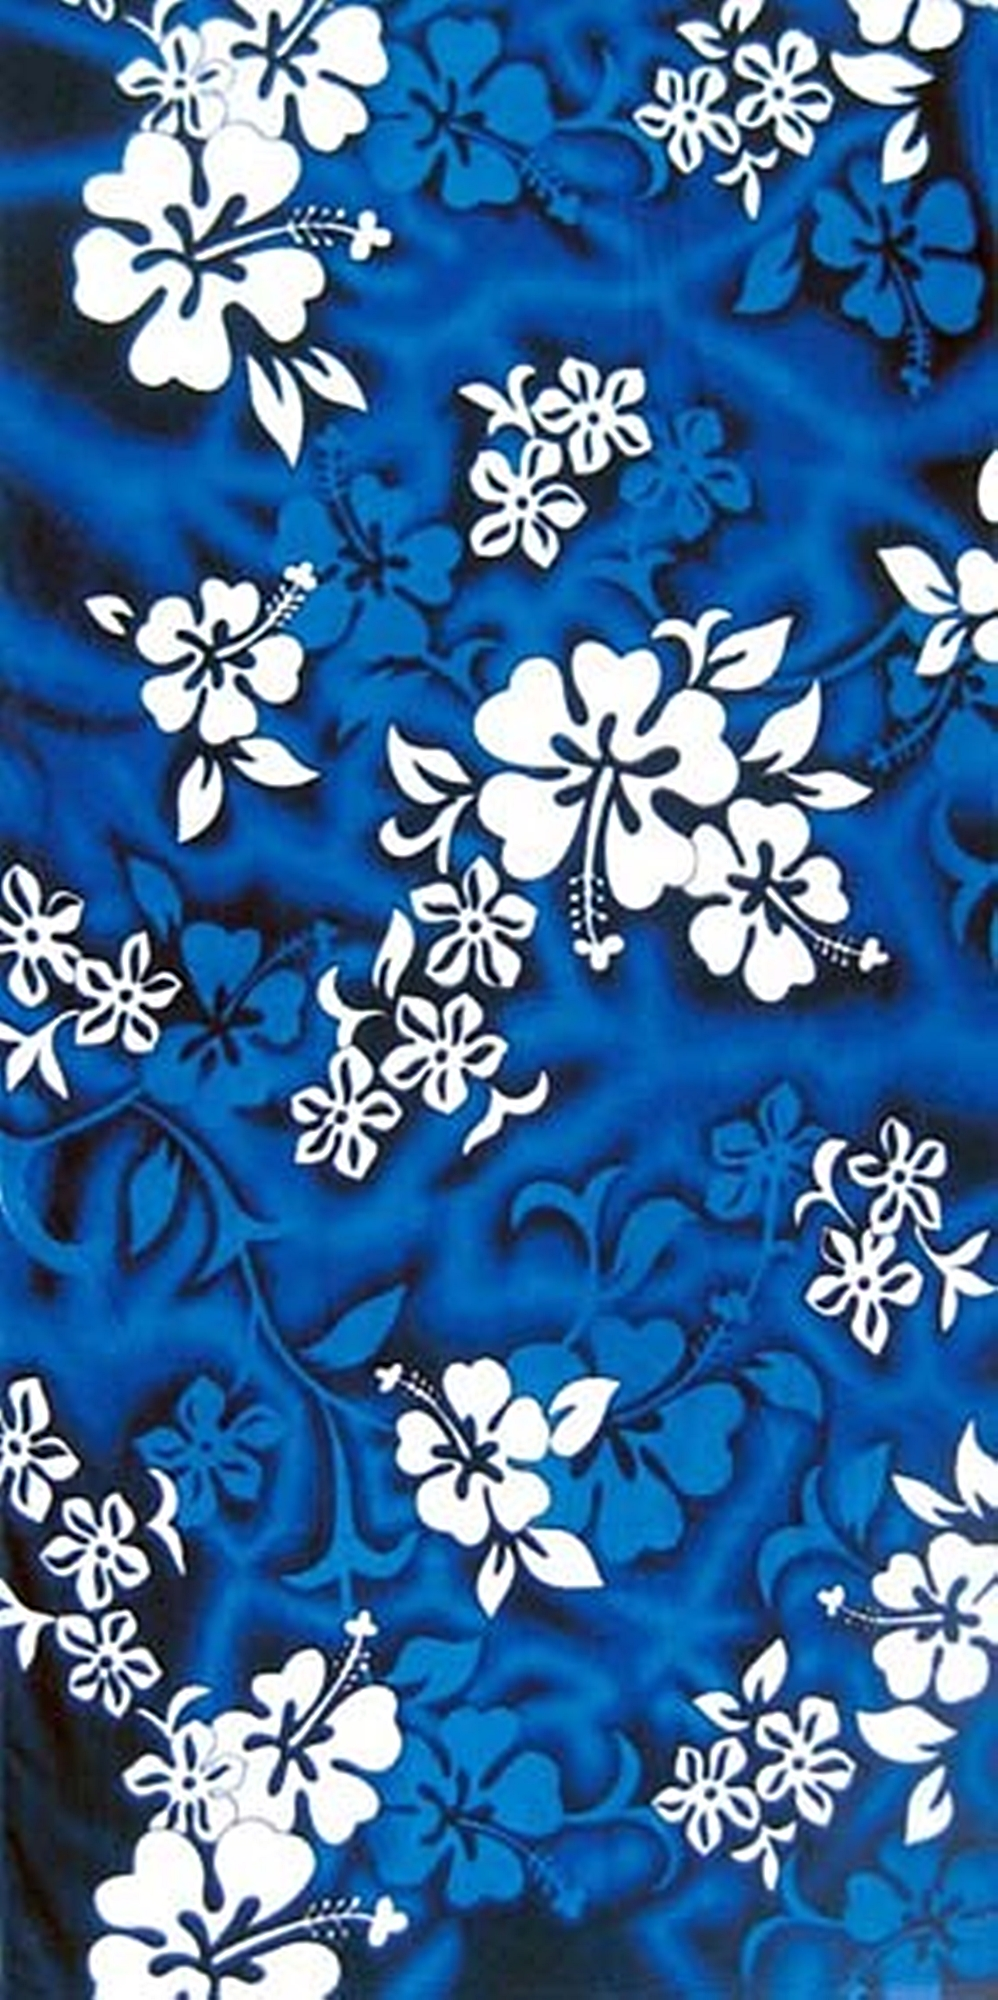 Island Gear Llc Hawaiian Flowers Towel 30x60 Bluewhite 689020397415